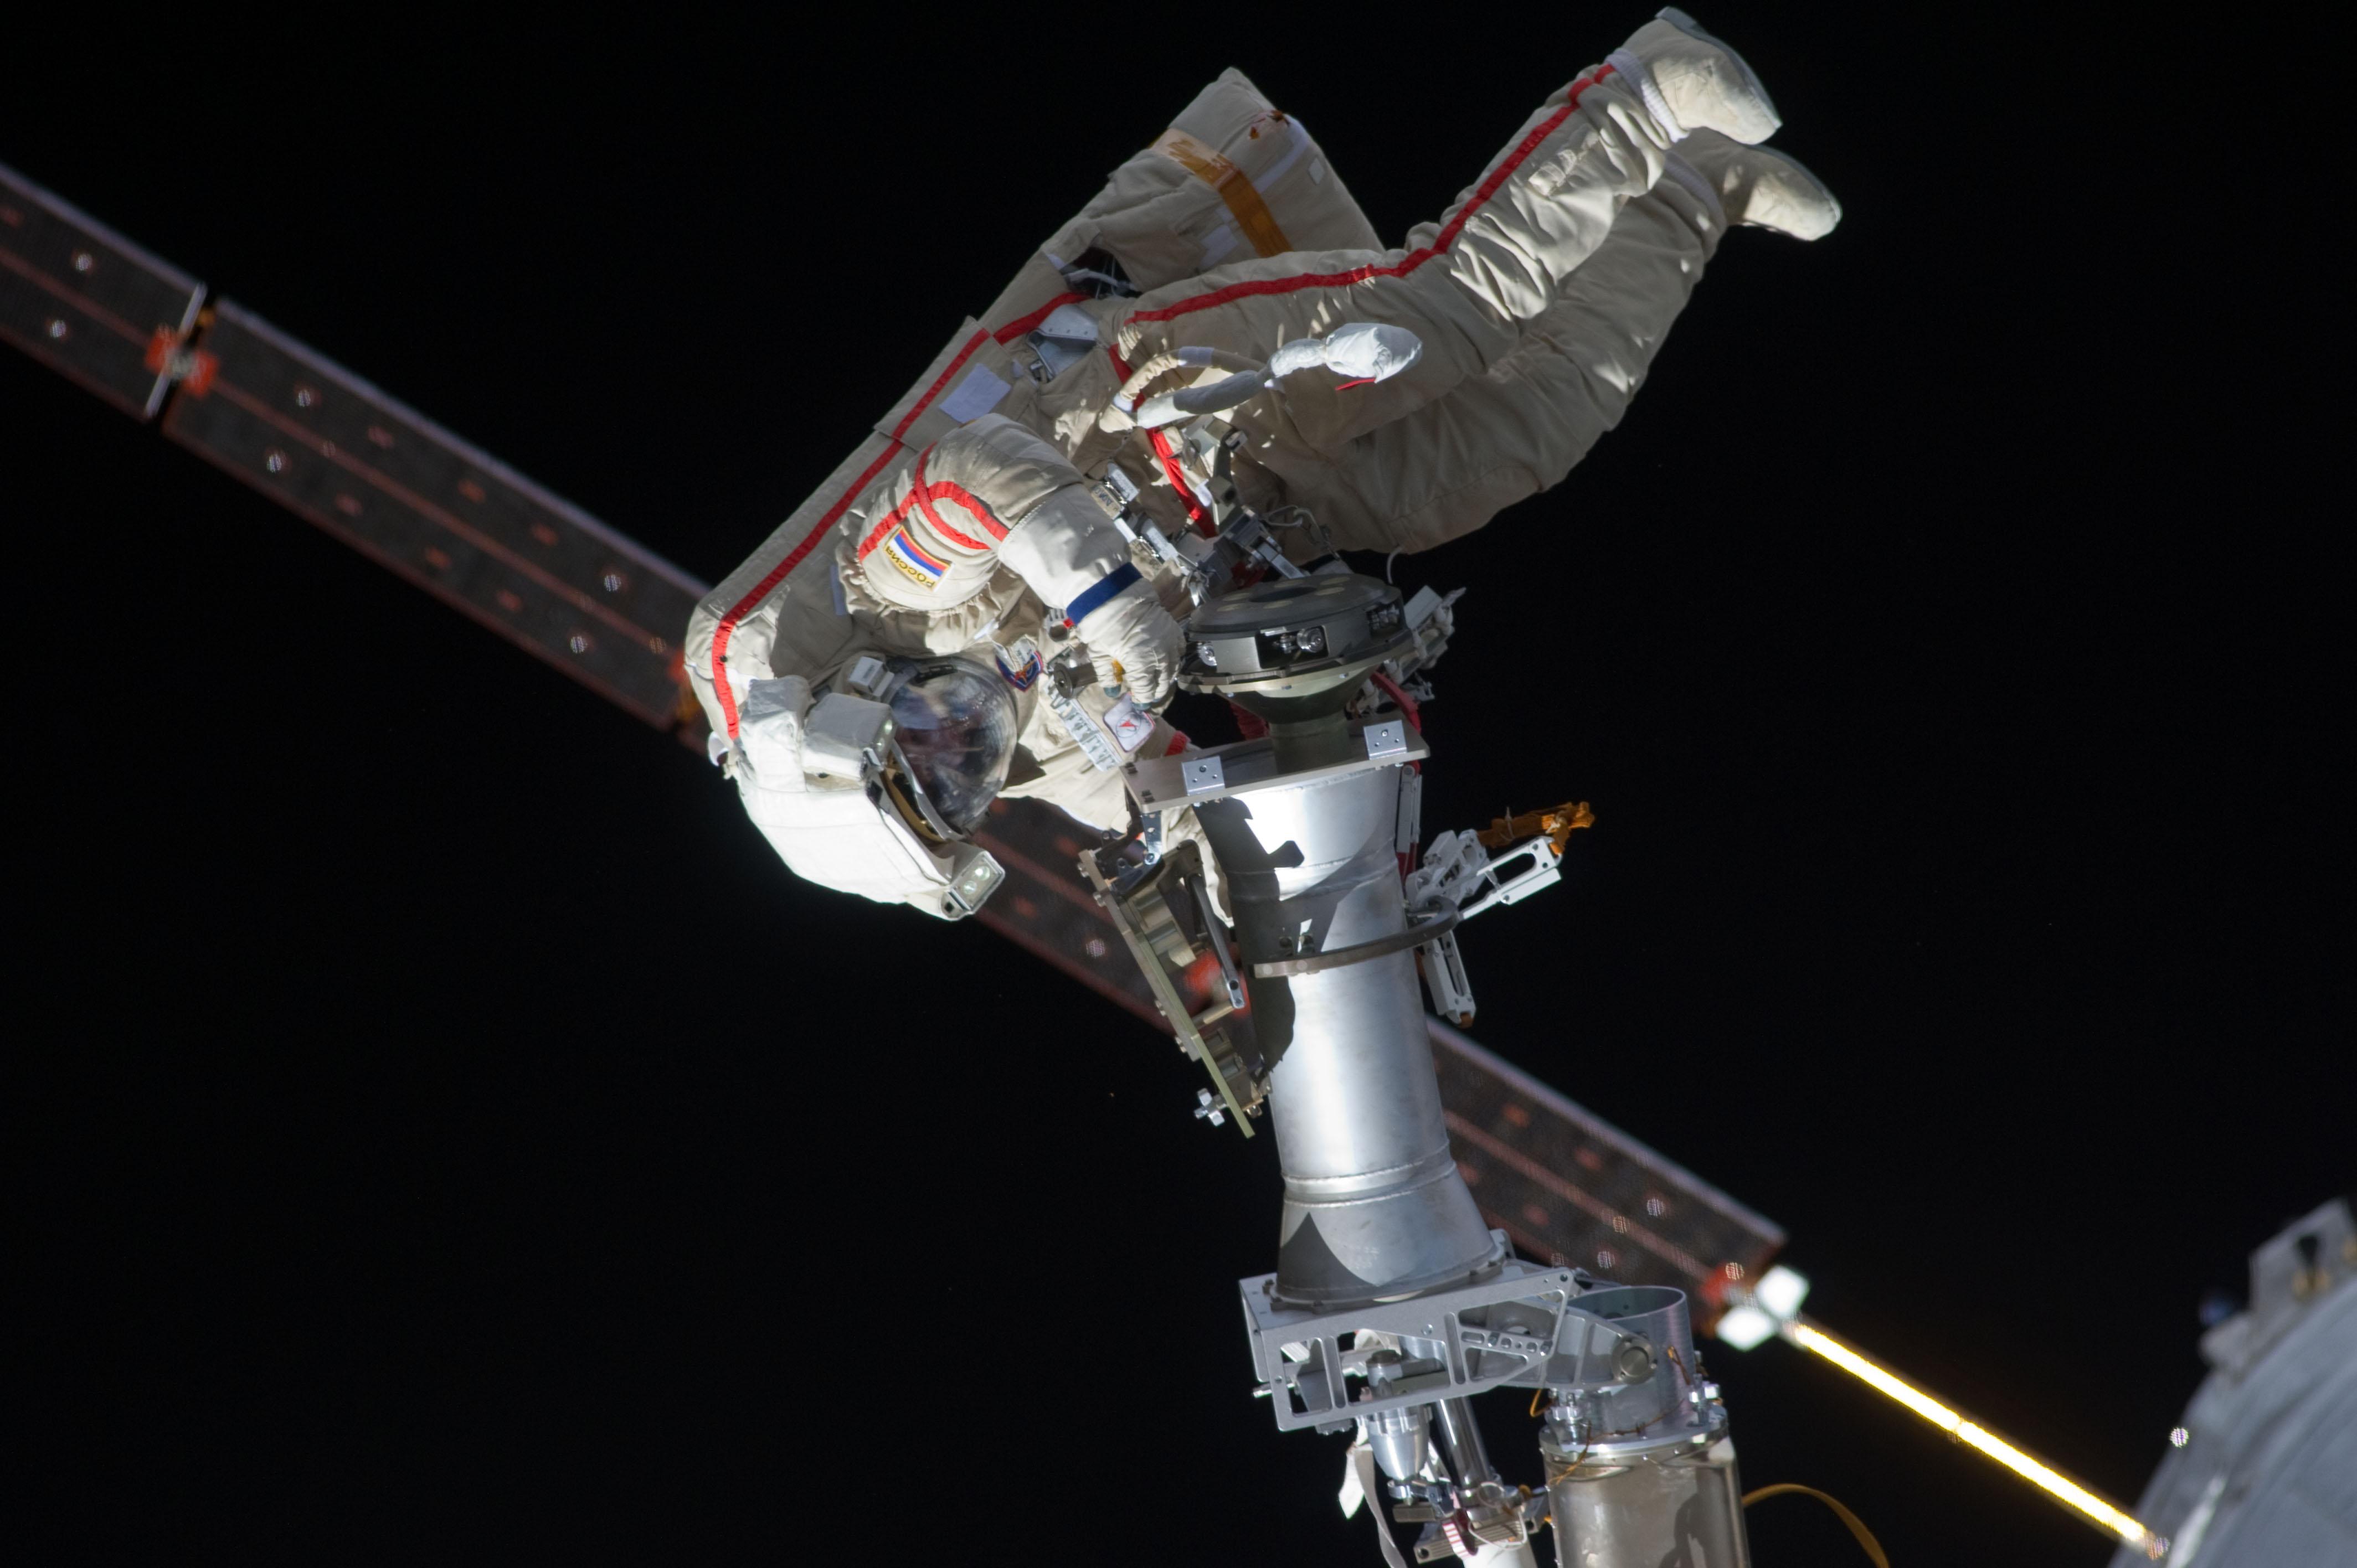 Russian Cosmonaut Gennady Padalka Floating Diagonally